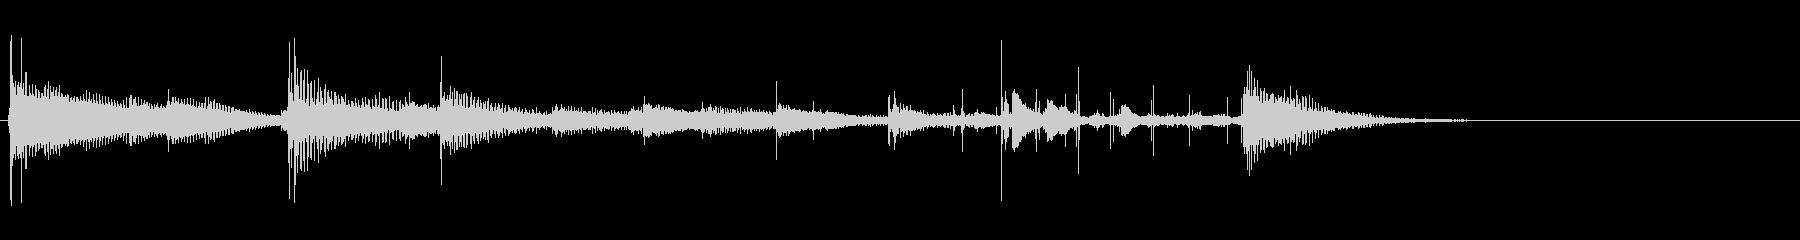 8bitゲーム風アイキャッチ音の未再生の波形